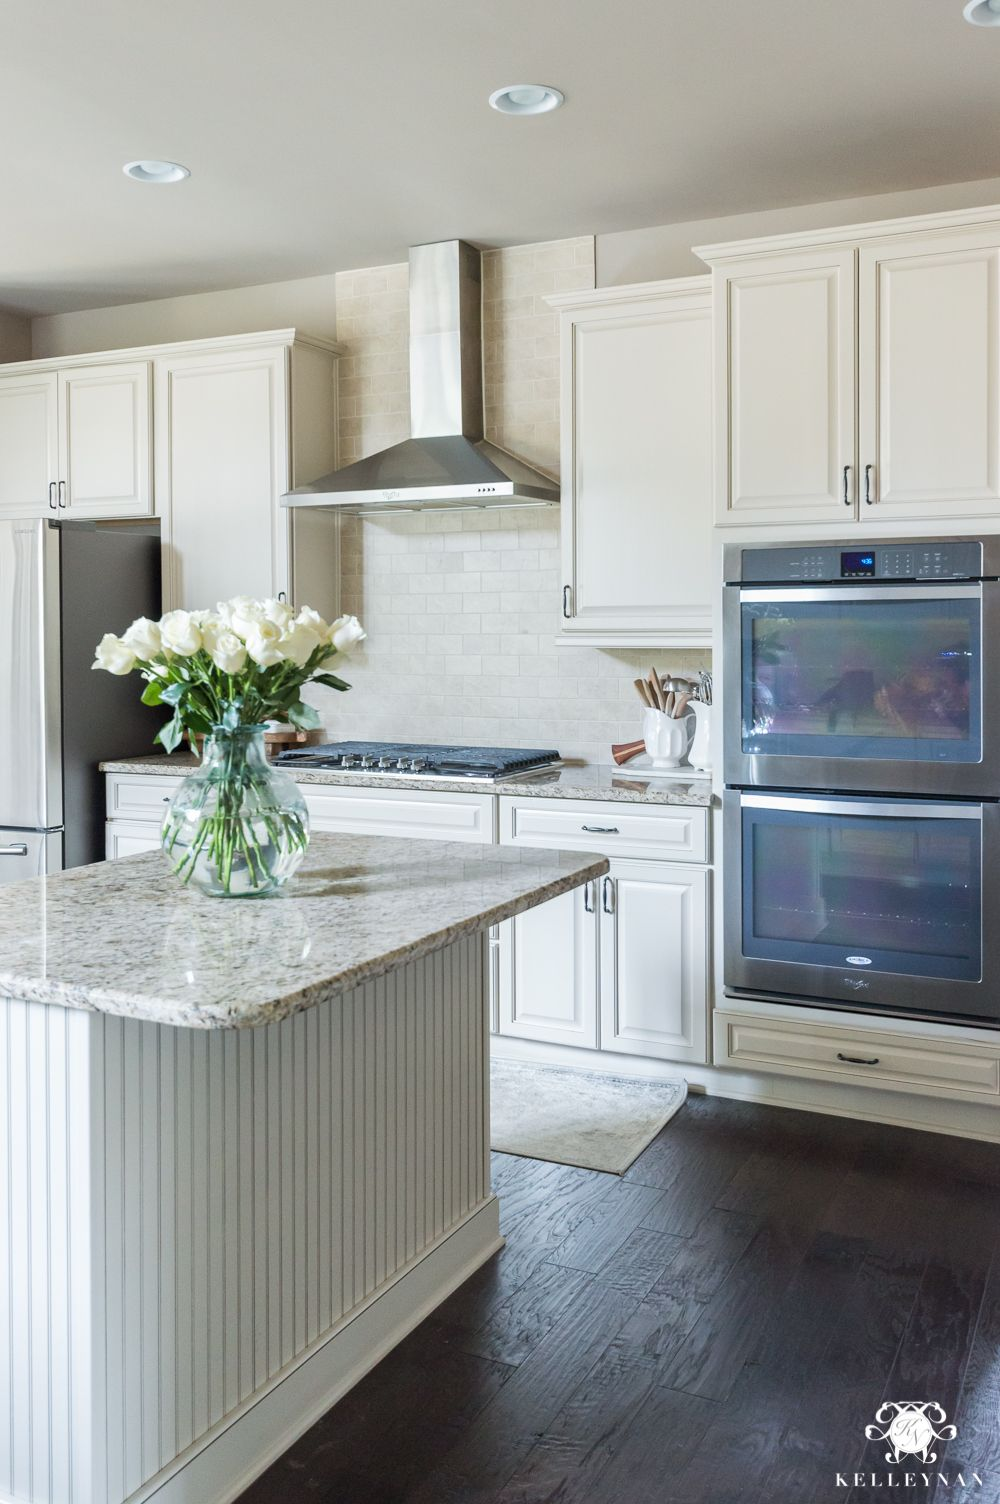 Best Easy Organized Baking And Spice Cabinet Kitchen Design 640 x 480